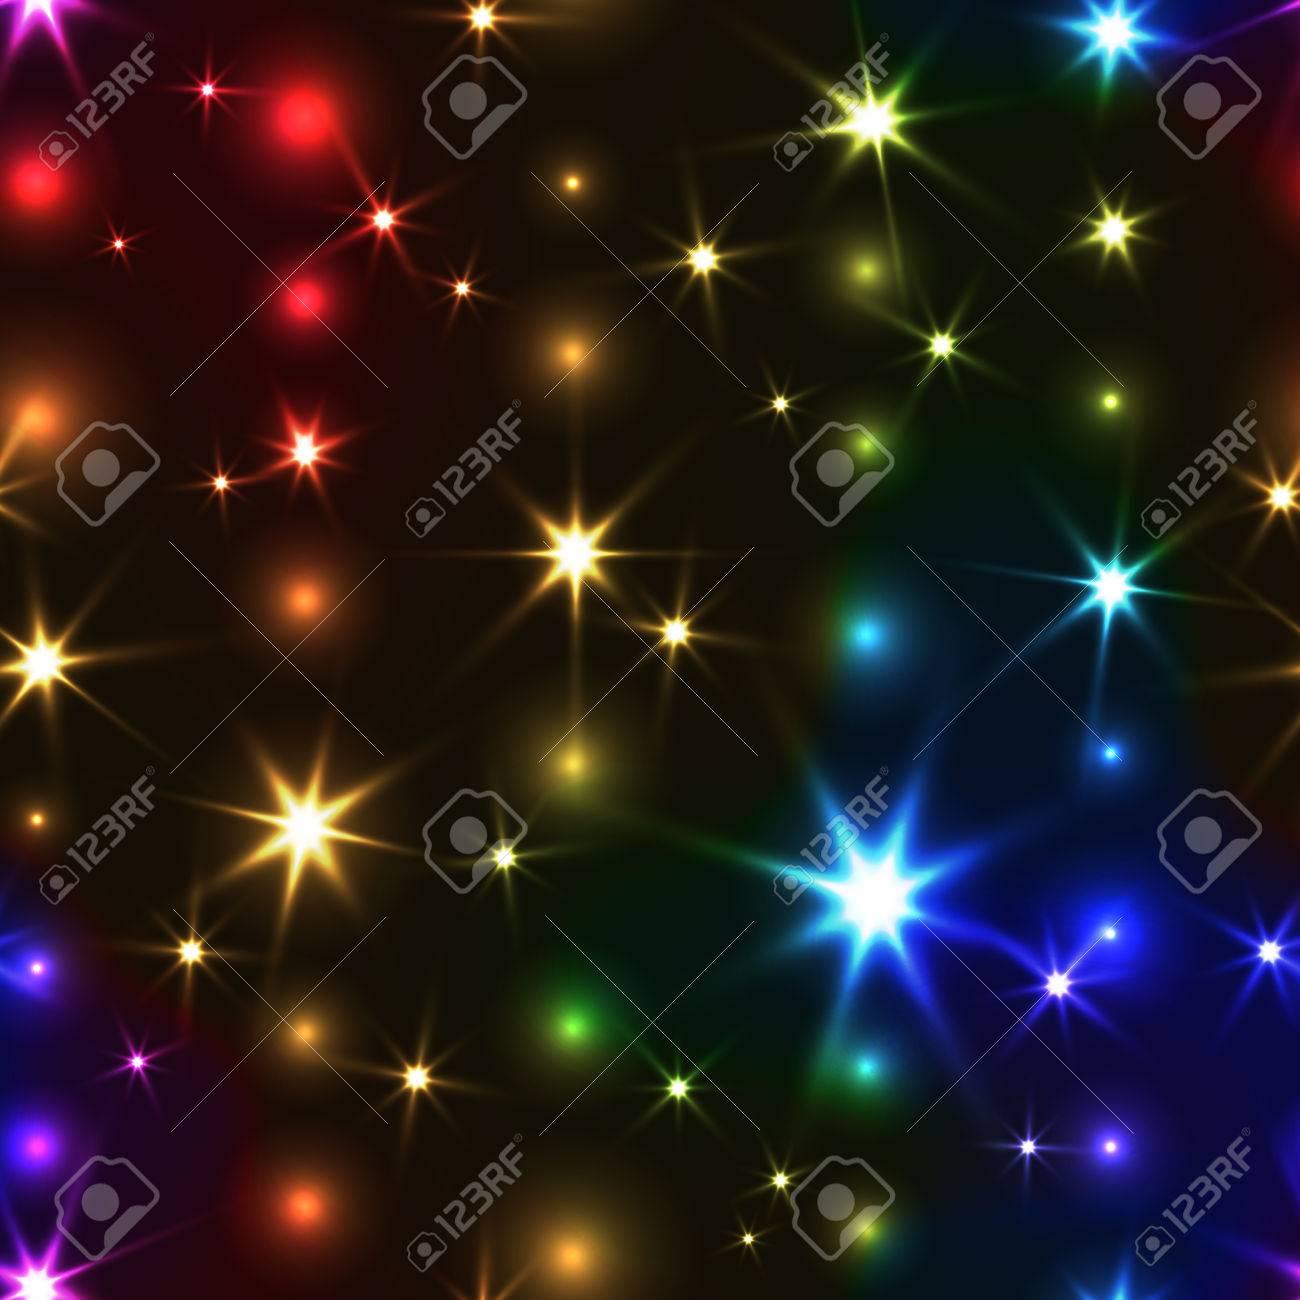 Rainbow seamless background with shiny Christmas chain  Festive